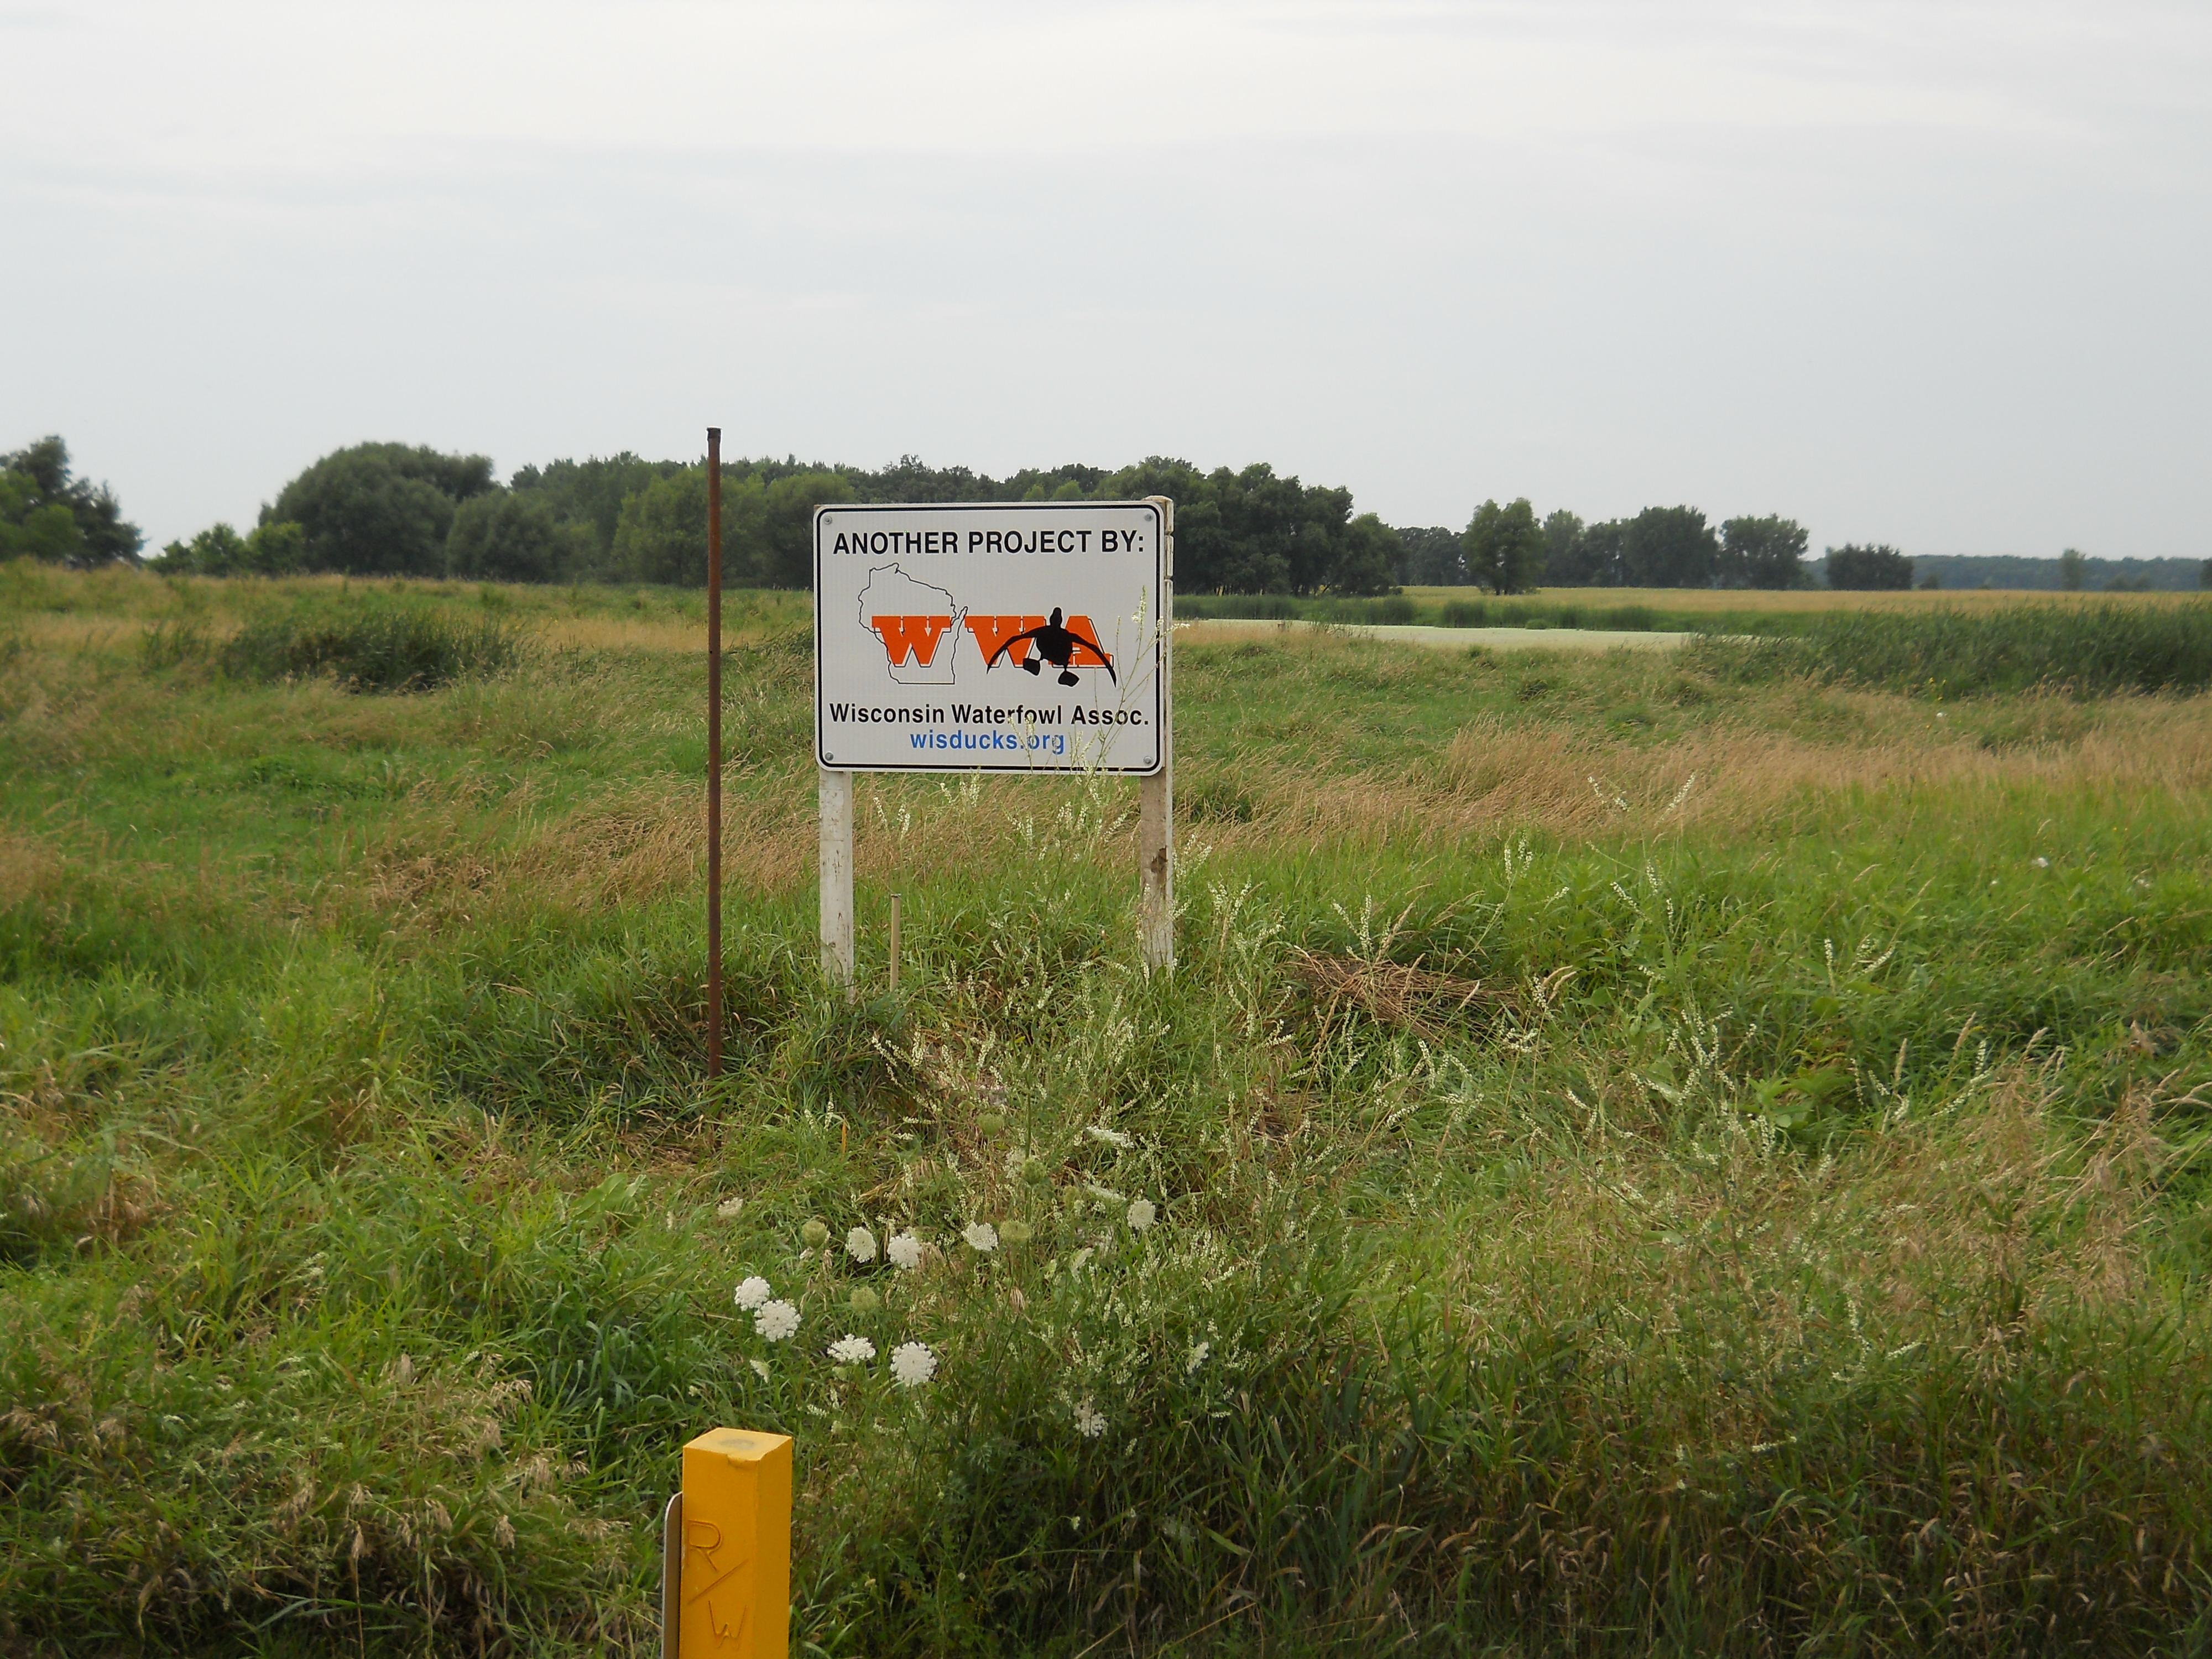 Project Sign 1 – Beaver Dam Guys